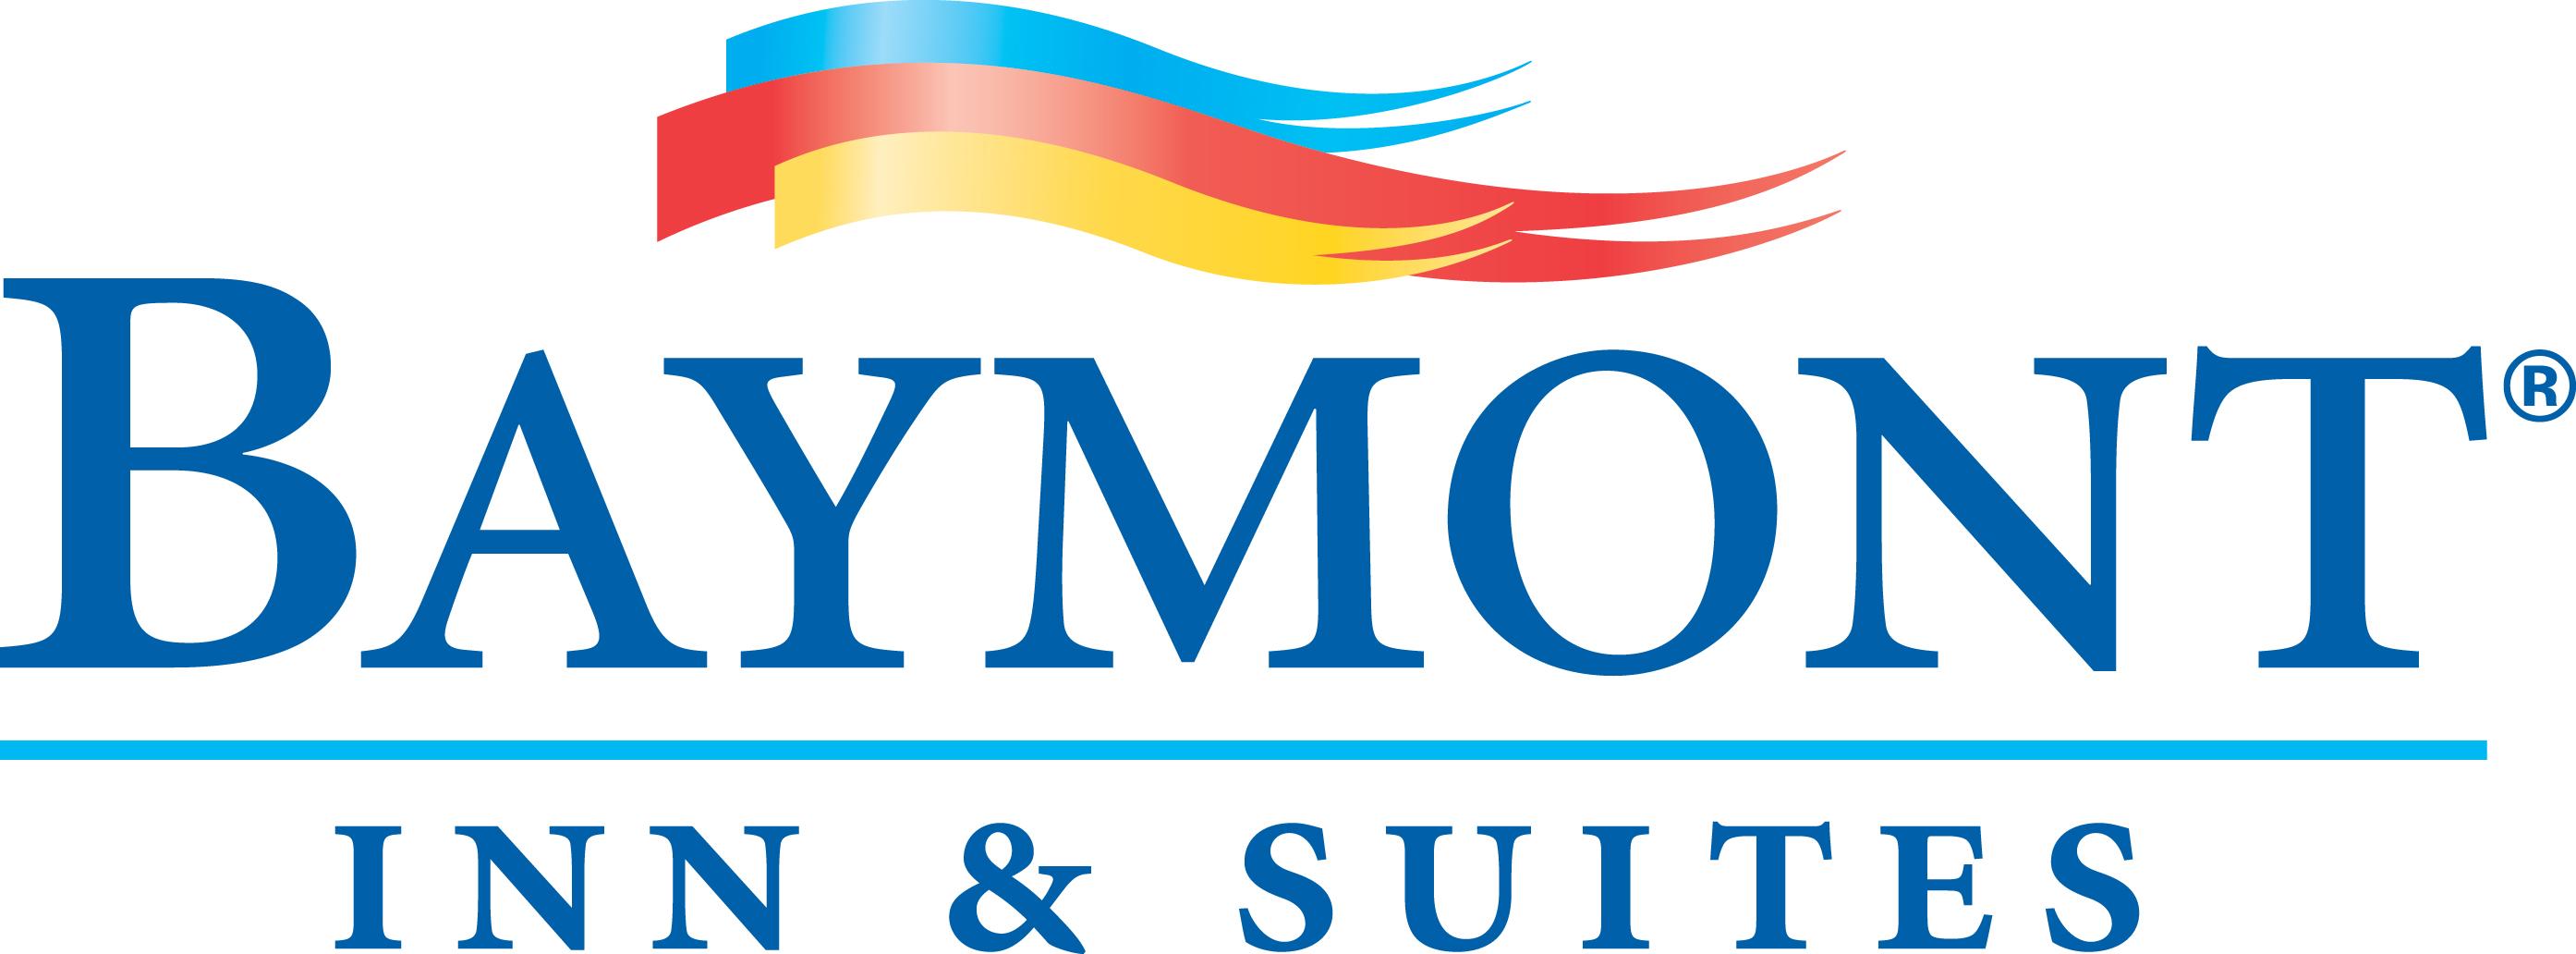 Baymont Inn Suites_2017_09